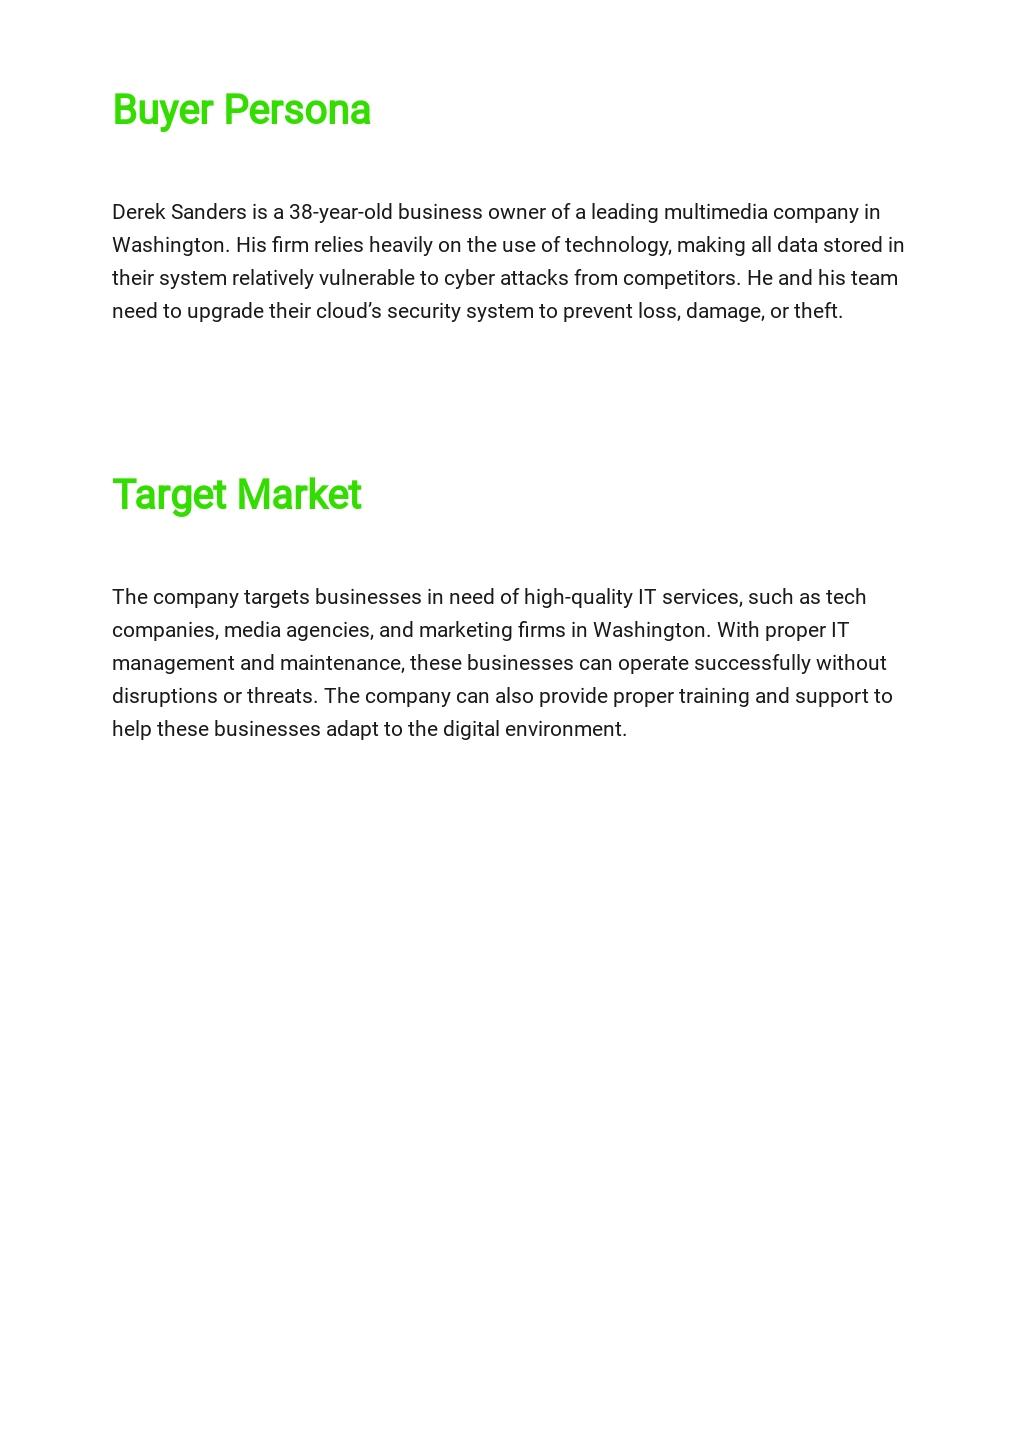 IT Business Marketing Plan Template 2.jpe